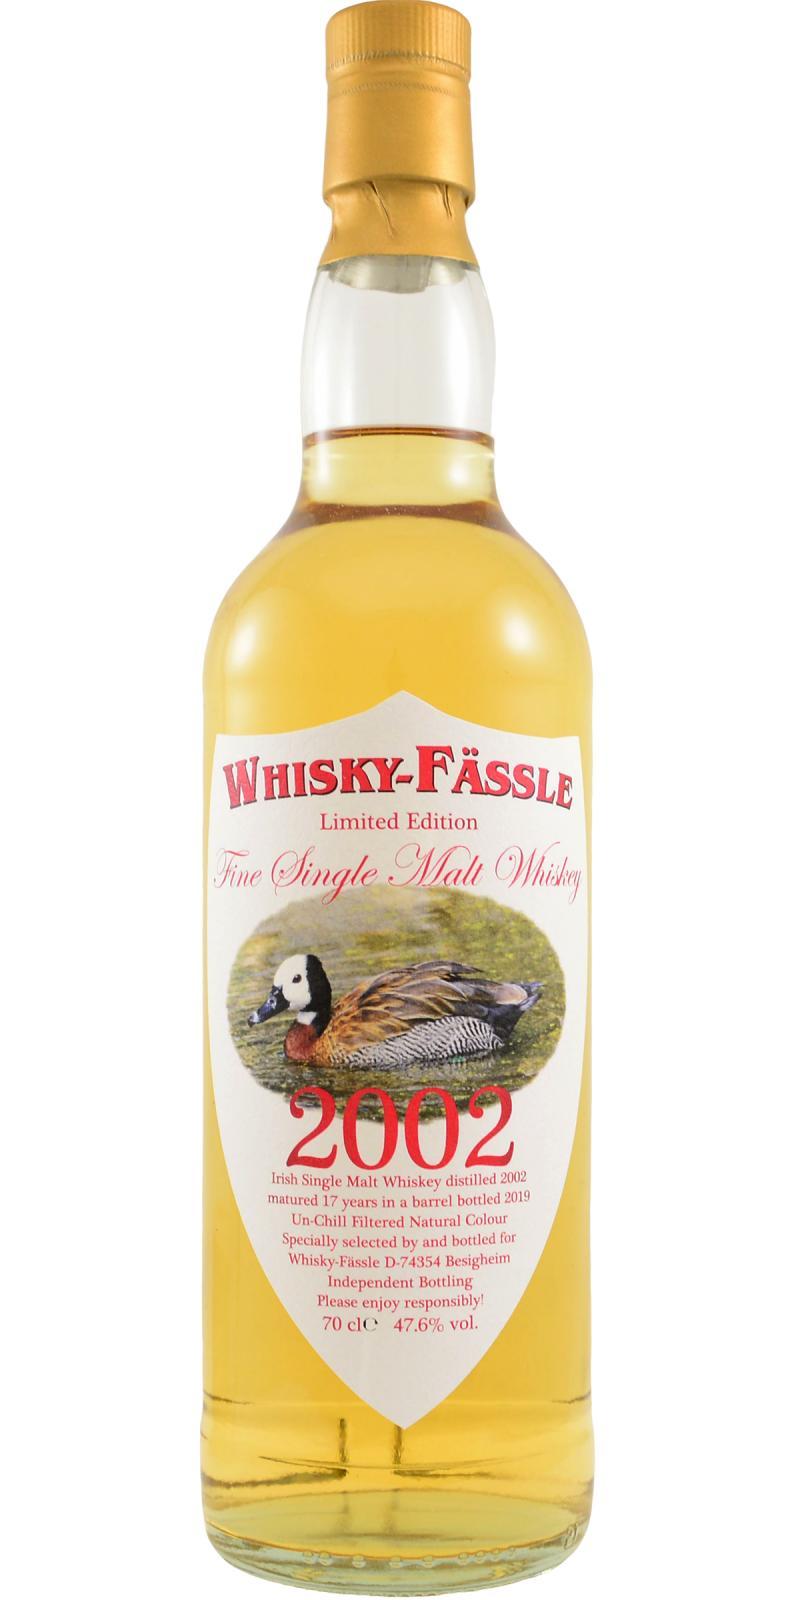 Irish Single Malt Whiskey 2002 W-F